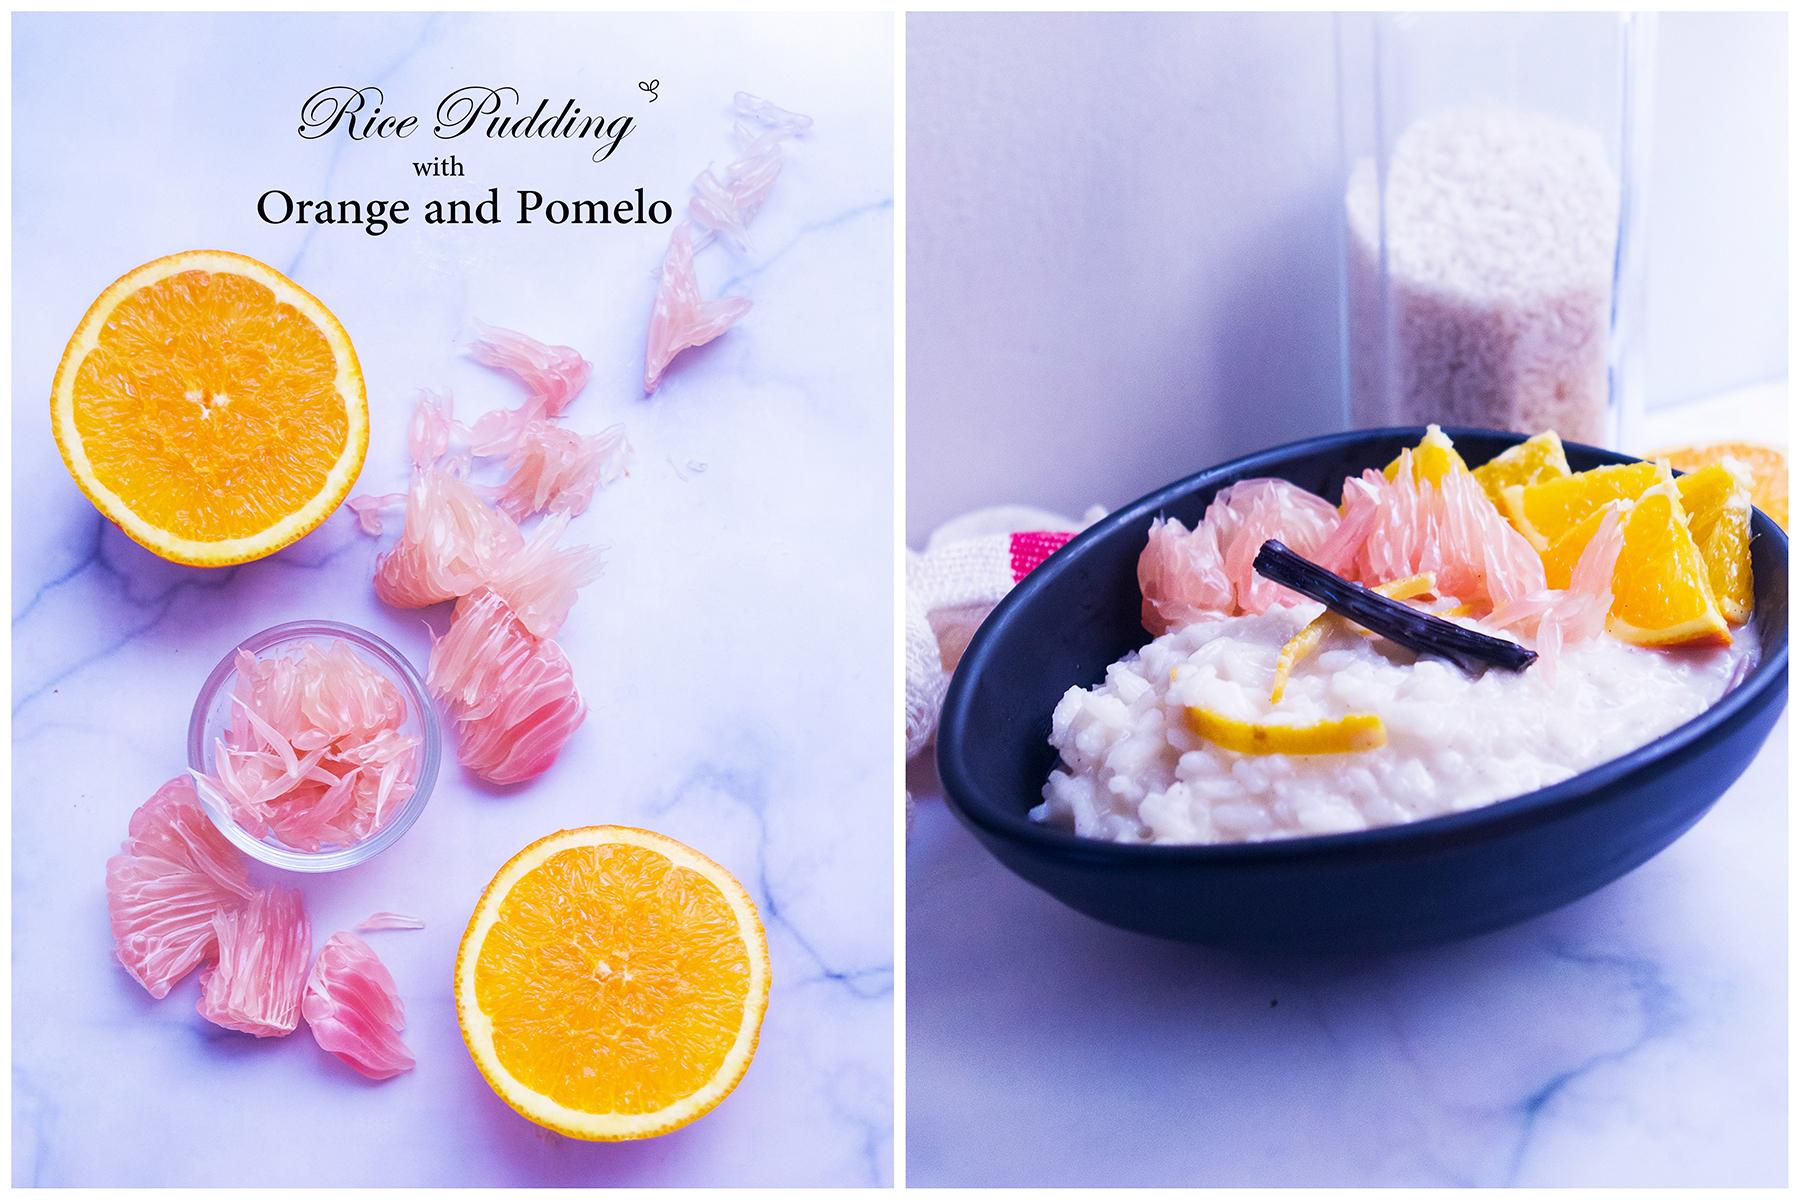 Orange-Pomelo Rice Pudding